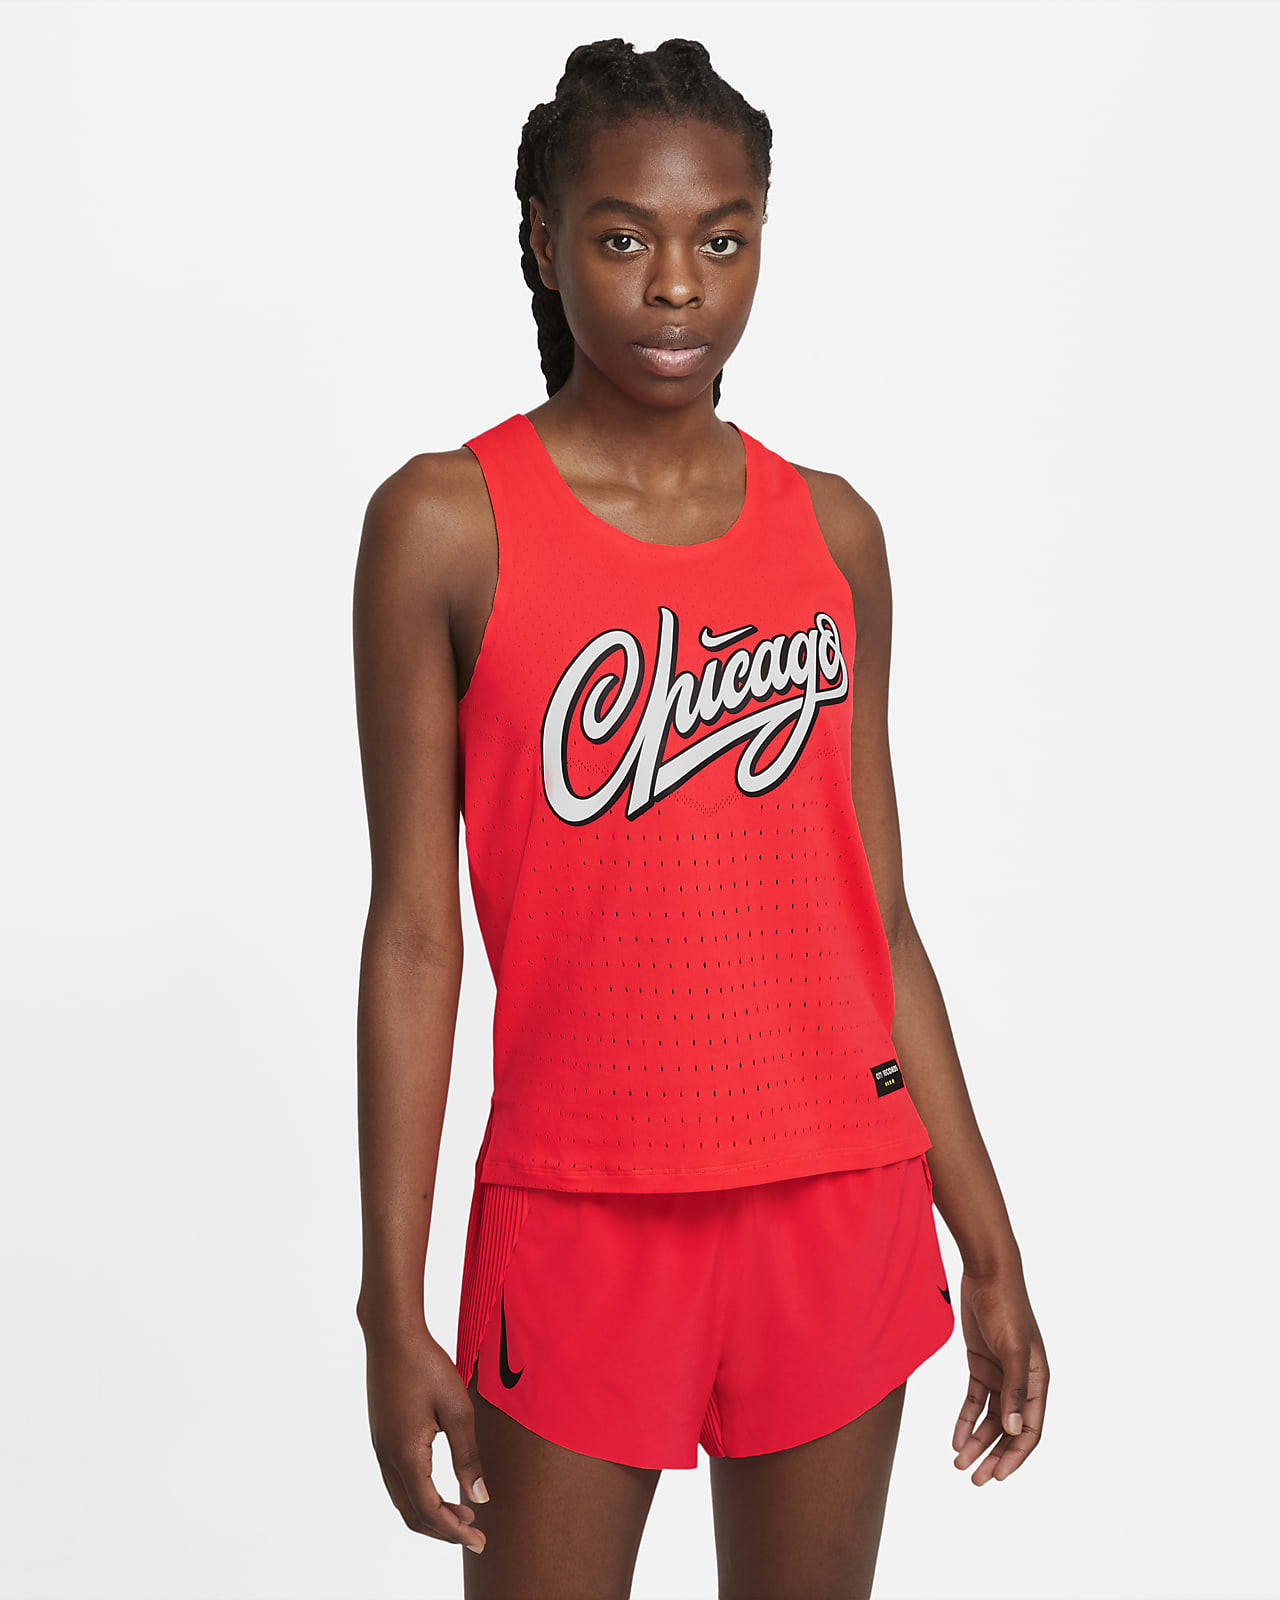 Camistea sin mangas de running para mujer Nike Dri-FIT ADV AeroSwift